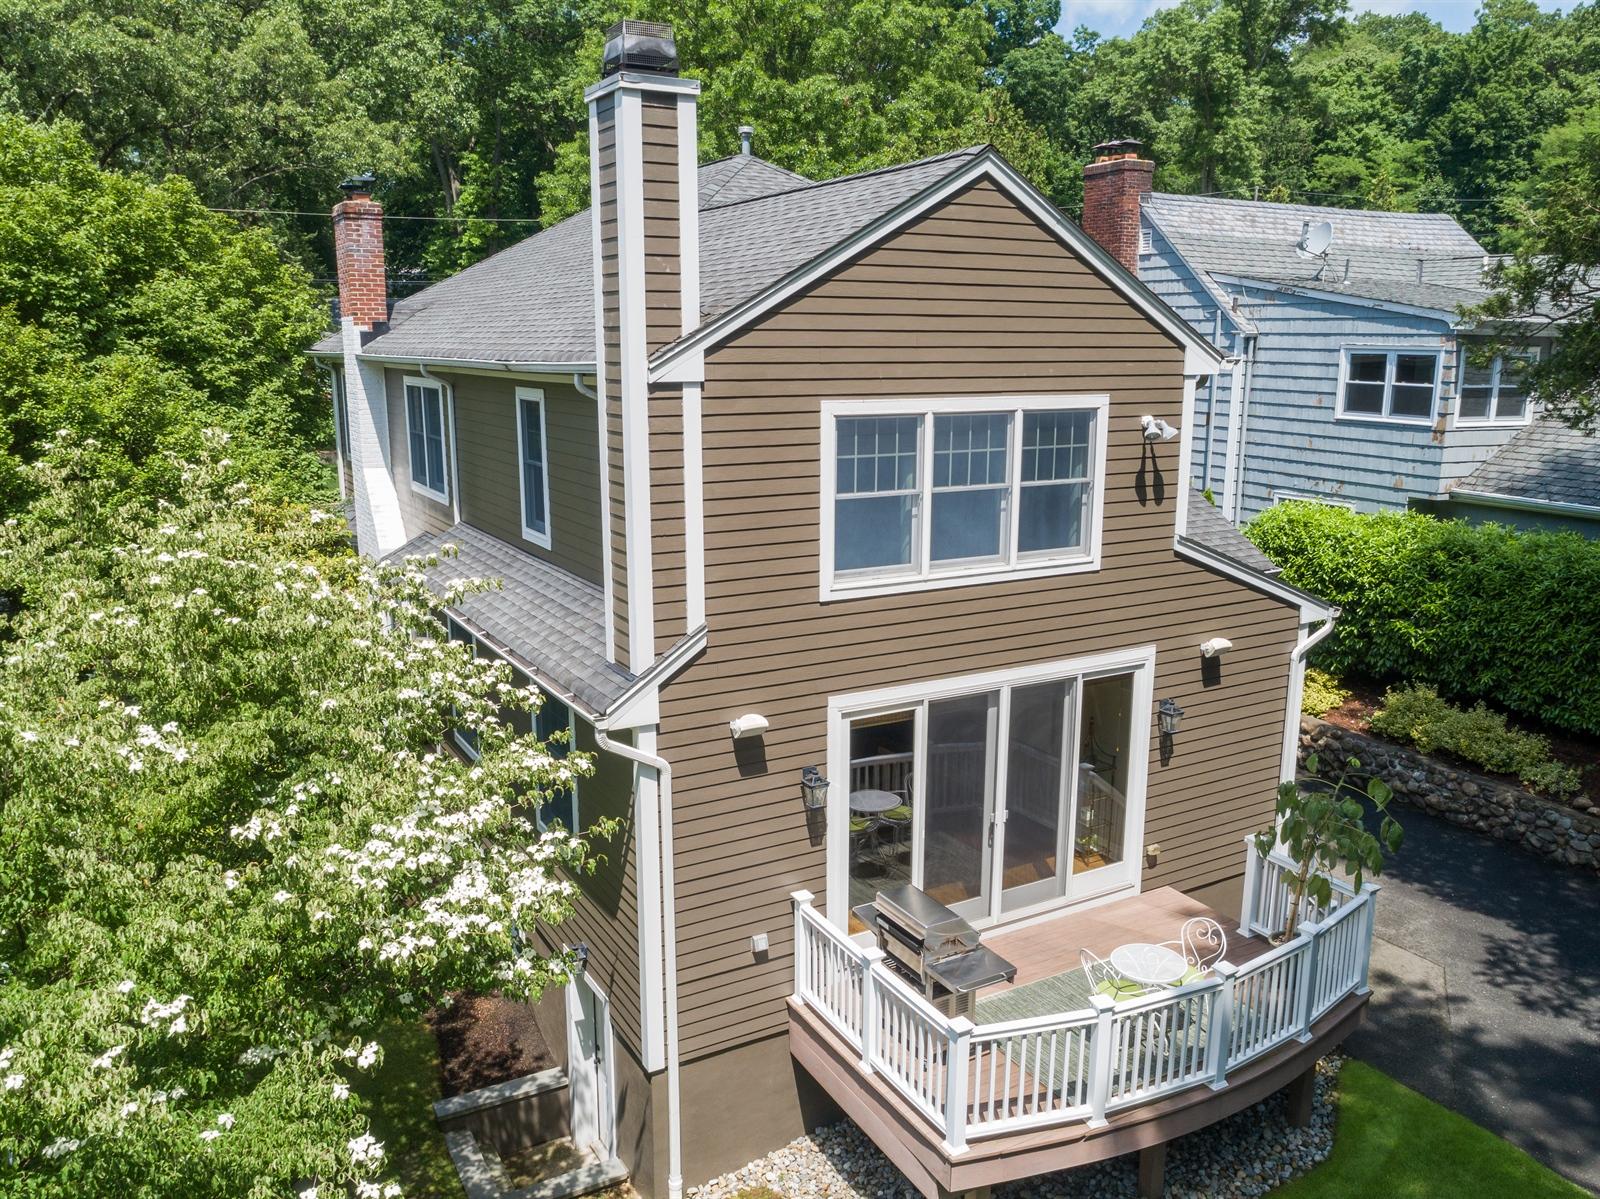 463 Upper Blvd, Ridgewood, NJ, 07450 | Virtual Tour